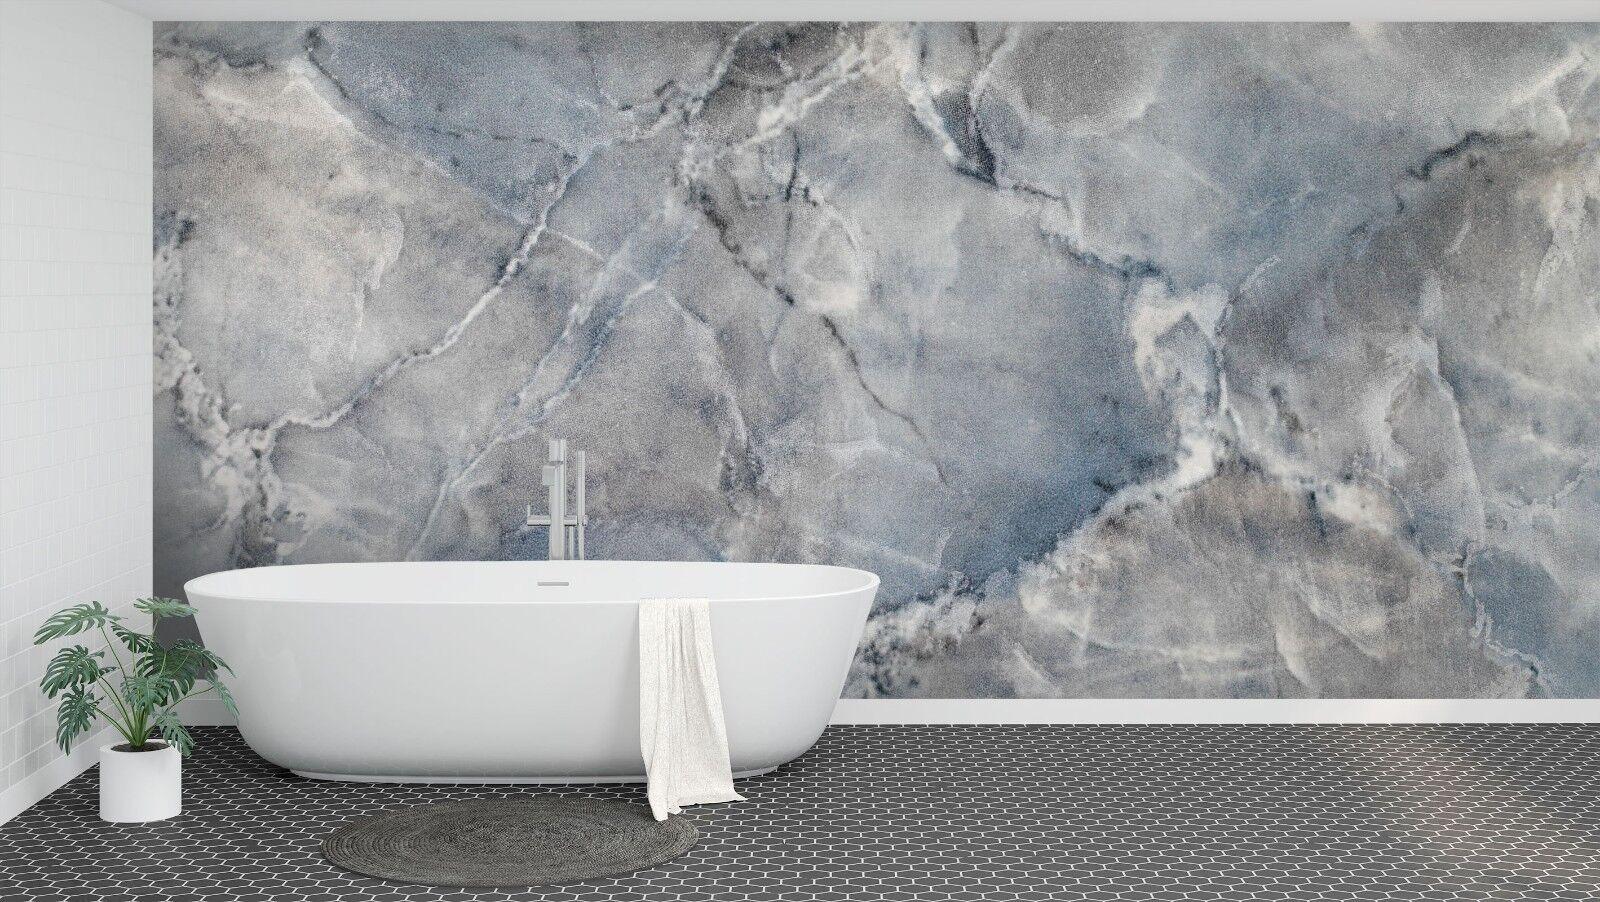 3D Stein Getreide 66 Textur Fliesen Marmor Tapeten Abziehbild Tapete Wandbild AJ